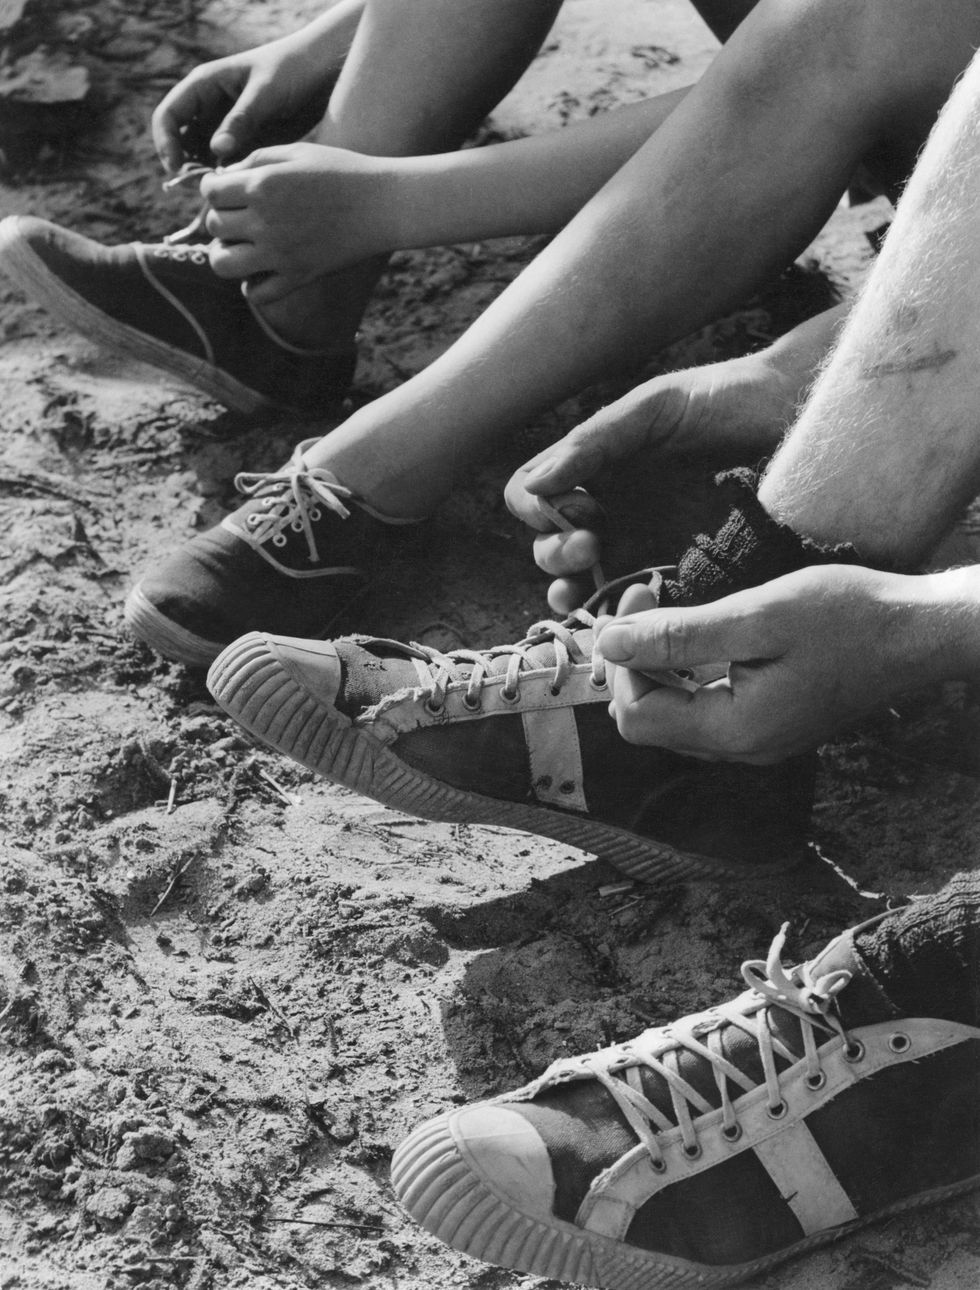 1955-giay-sneaker-elleman-0220-ullstein